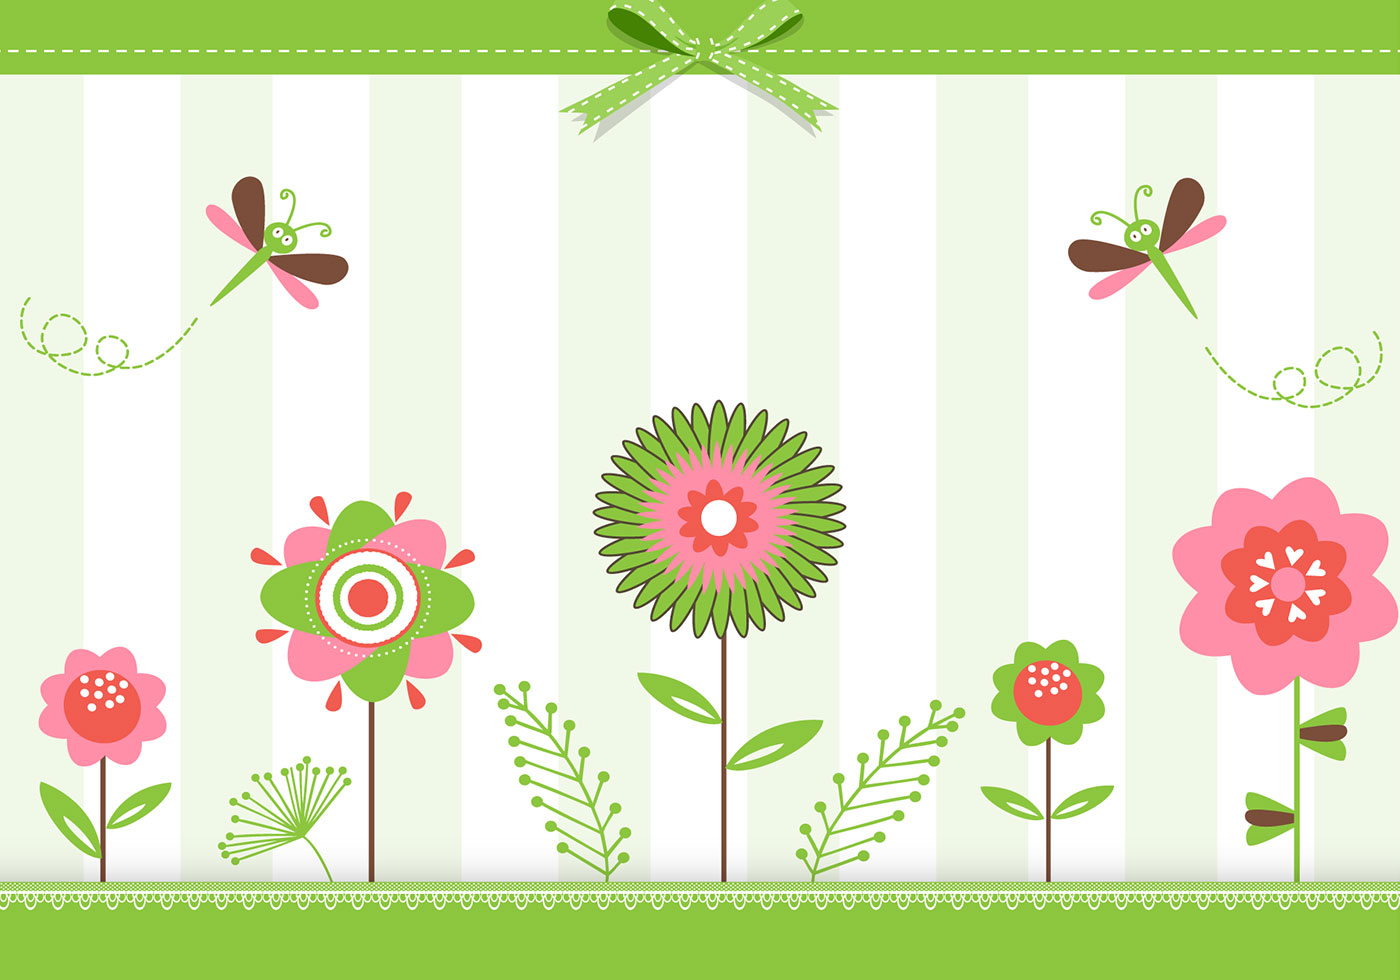 Green Floral Greeting Card Vector - Download Free Vectors ...